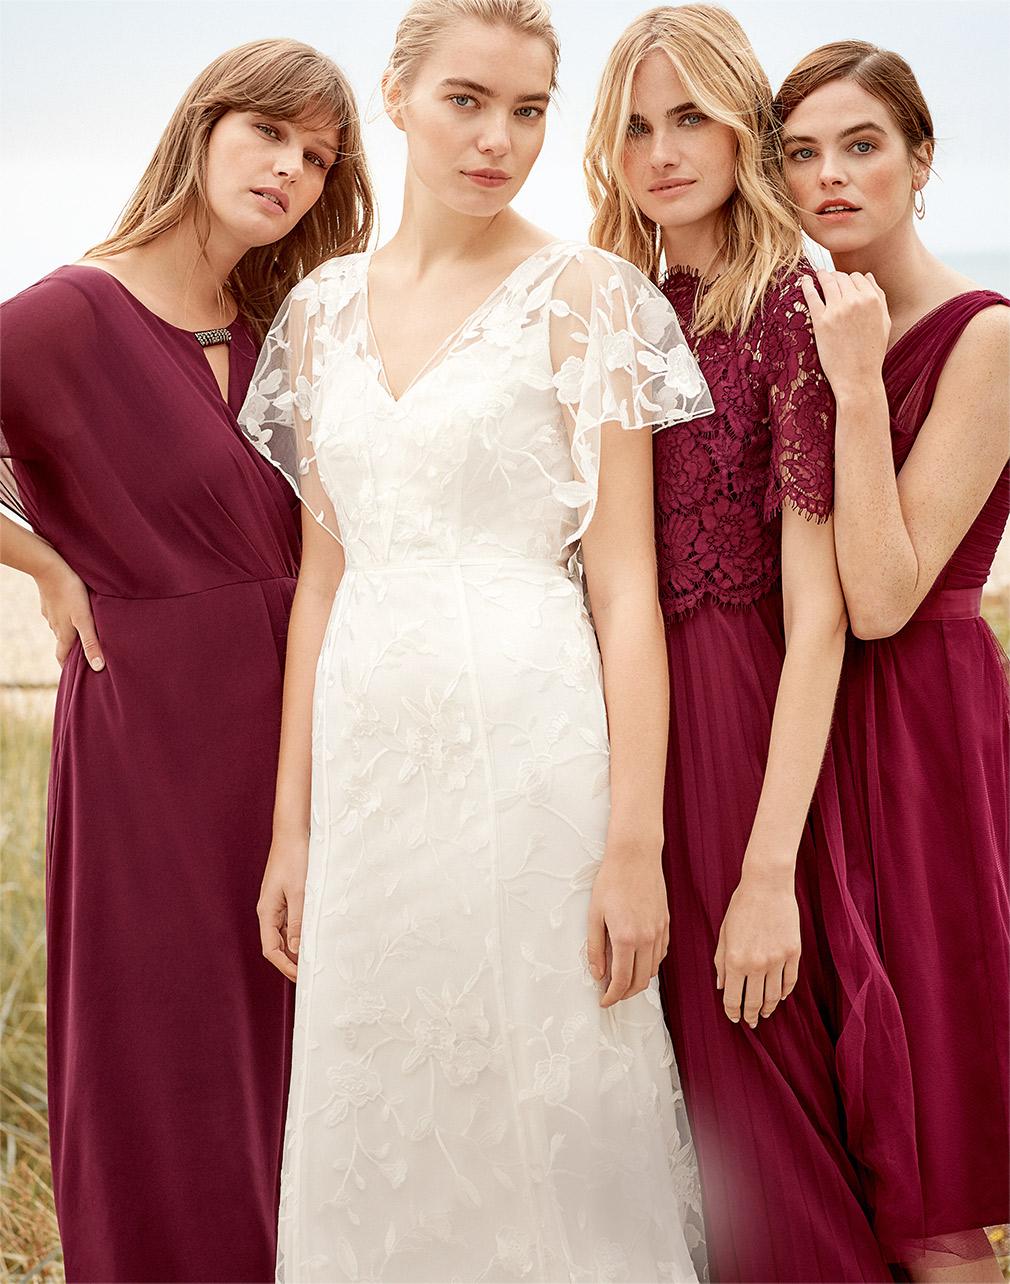 Layla Bridal Dress £450 | Elisabetta Dress £160 | Romy Tulle Dress £140